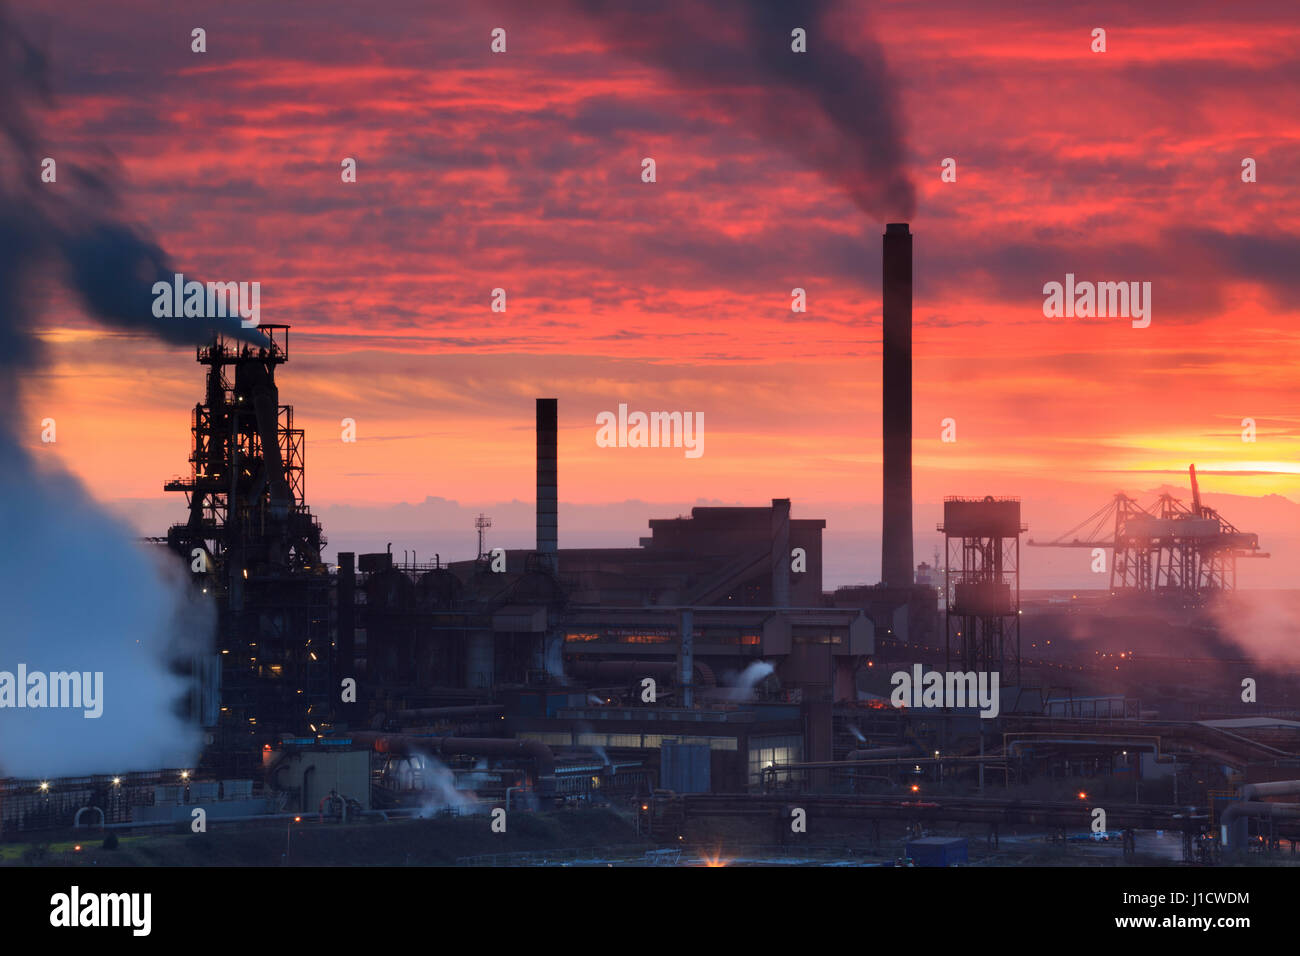 Sonnenuntergang über Port Talbot Stahl arbeitet in Süd-Wales Stockfoto